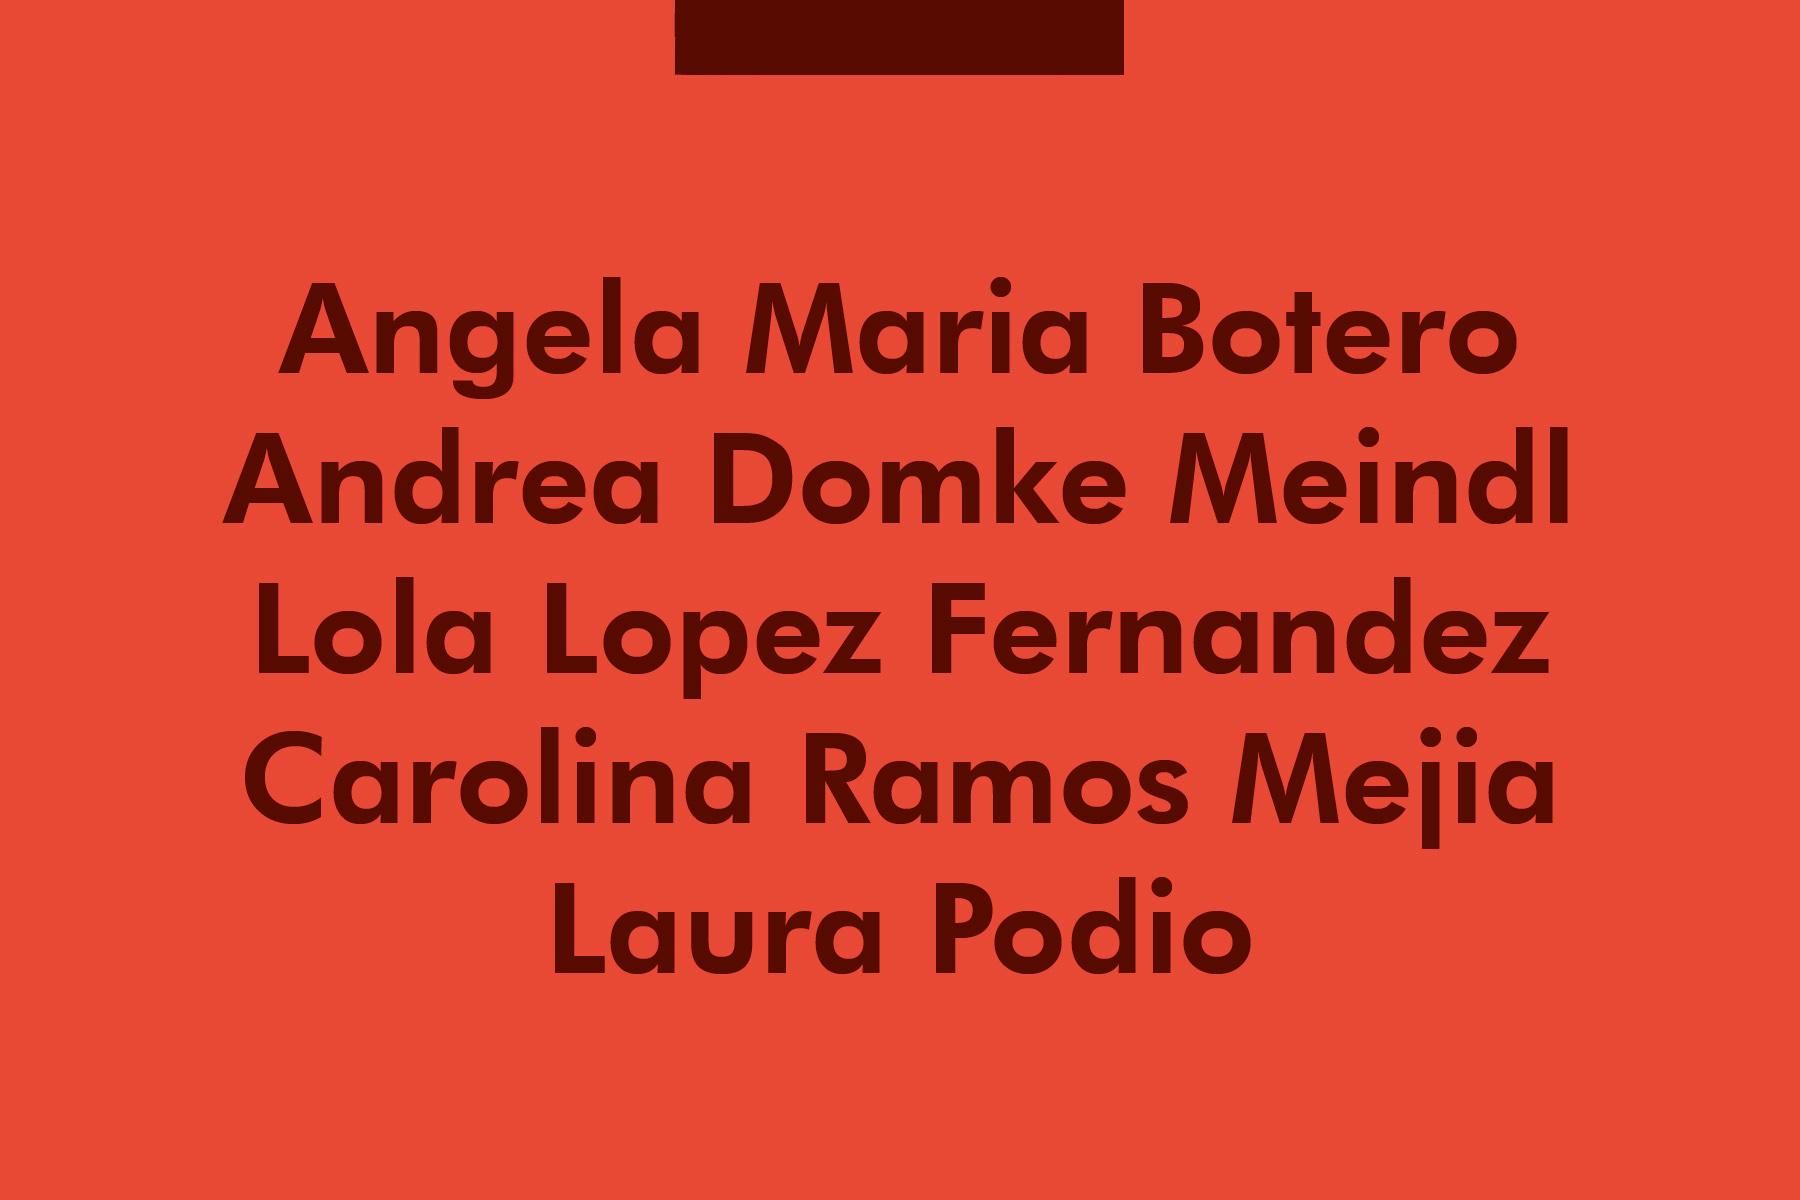 Ibero-American Artists